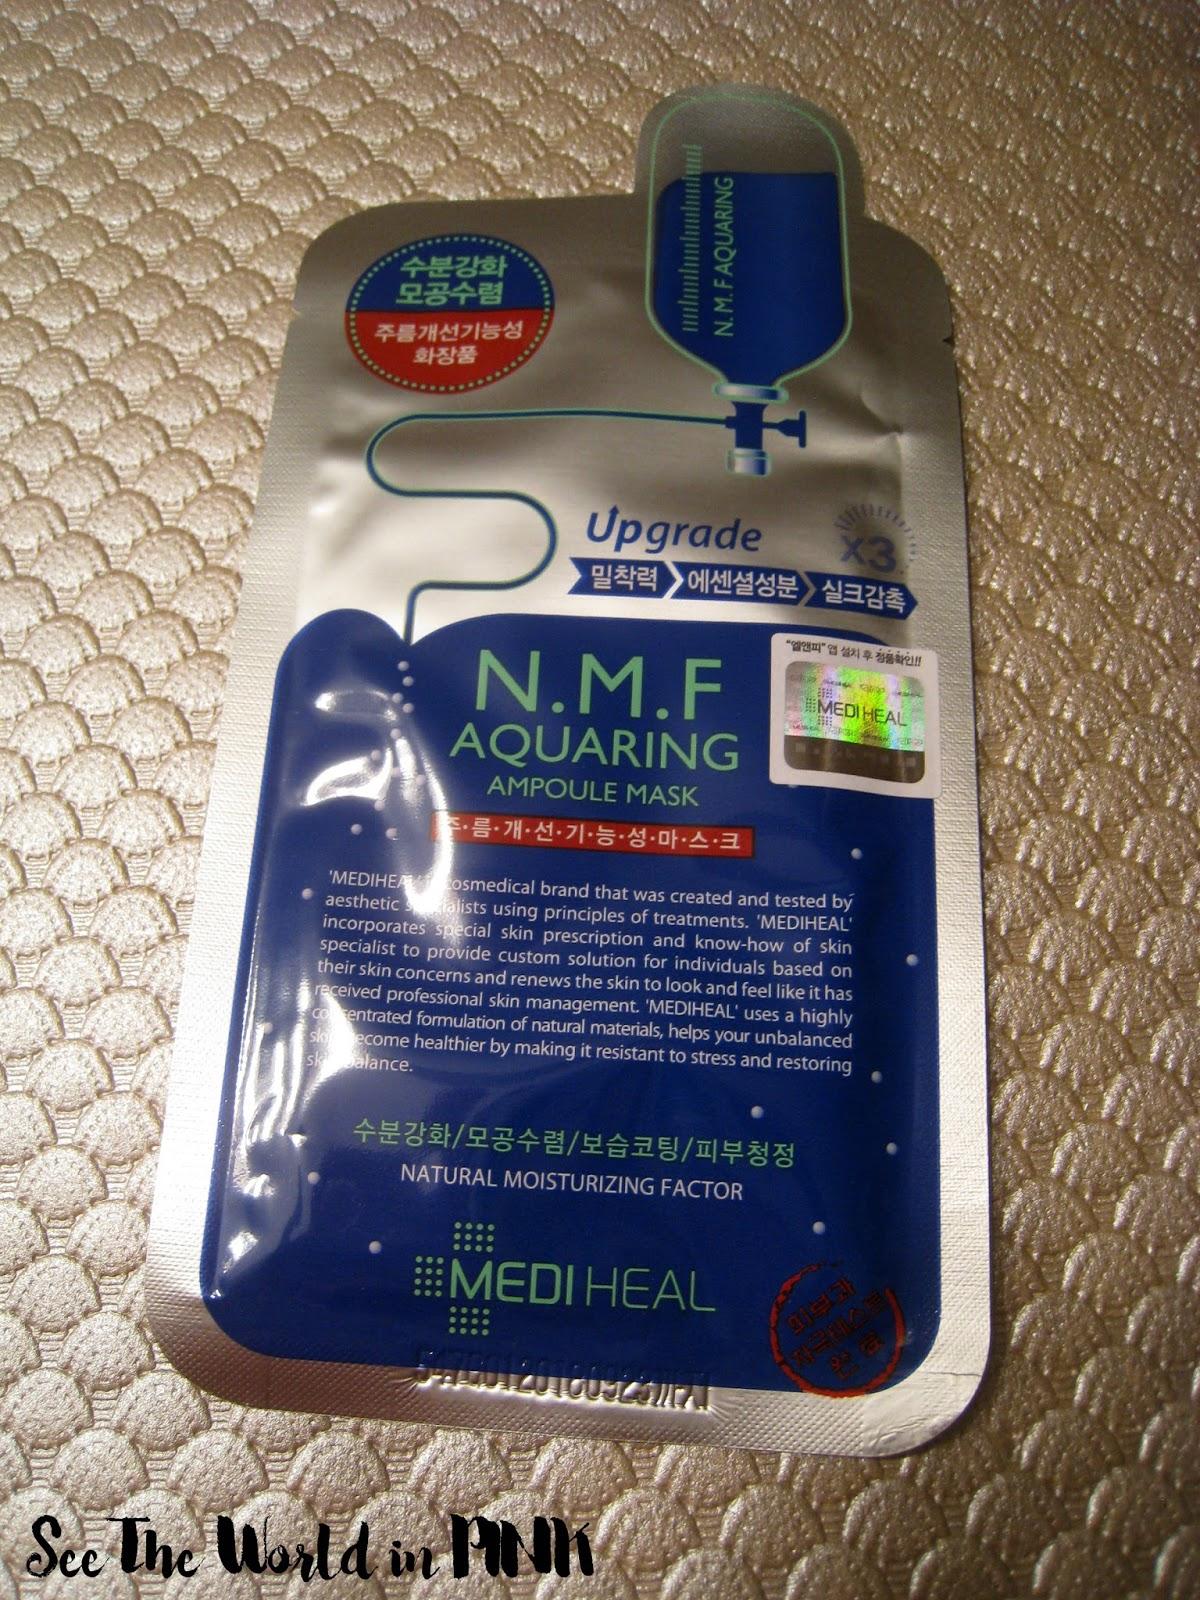 Mediheal N.M.F. Aquaring Ampoule Mask